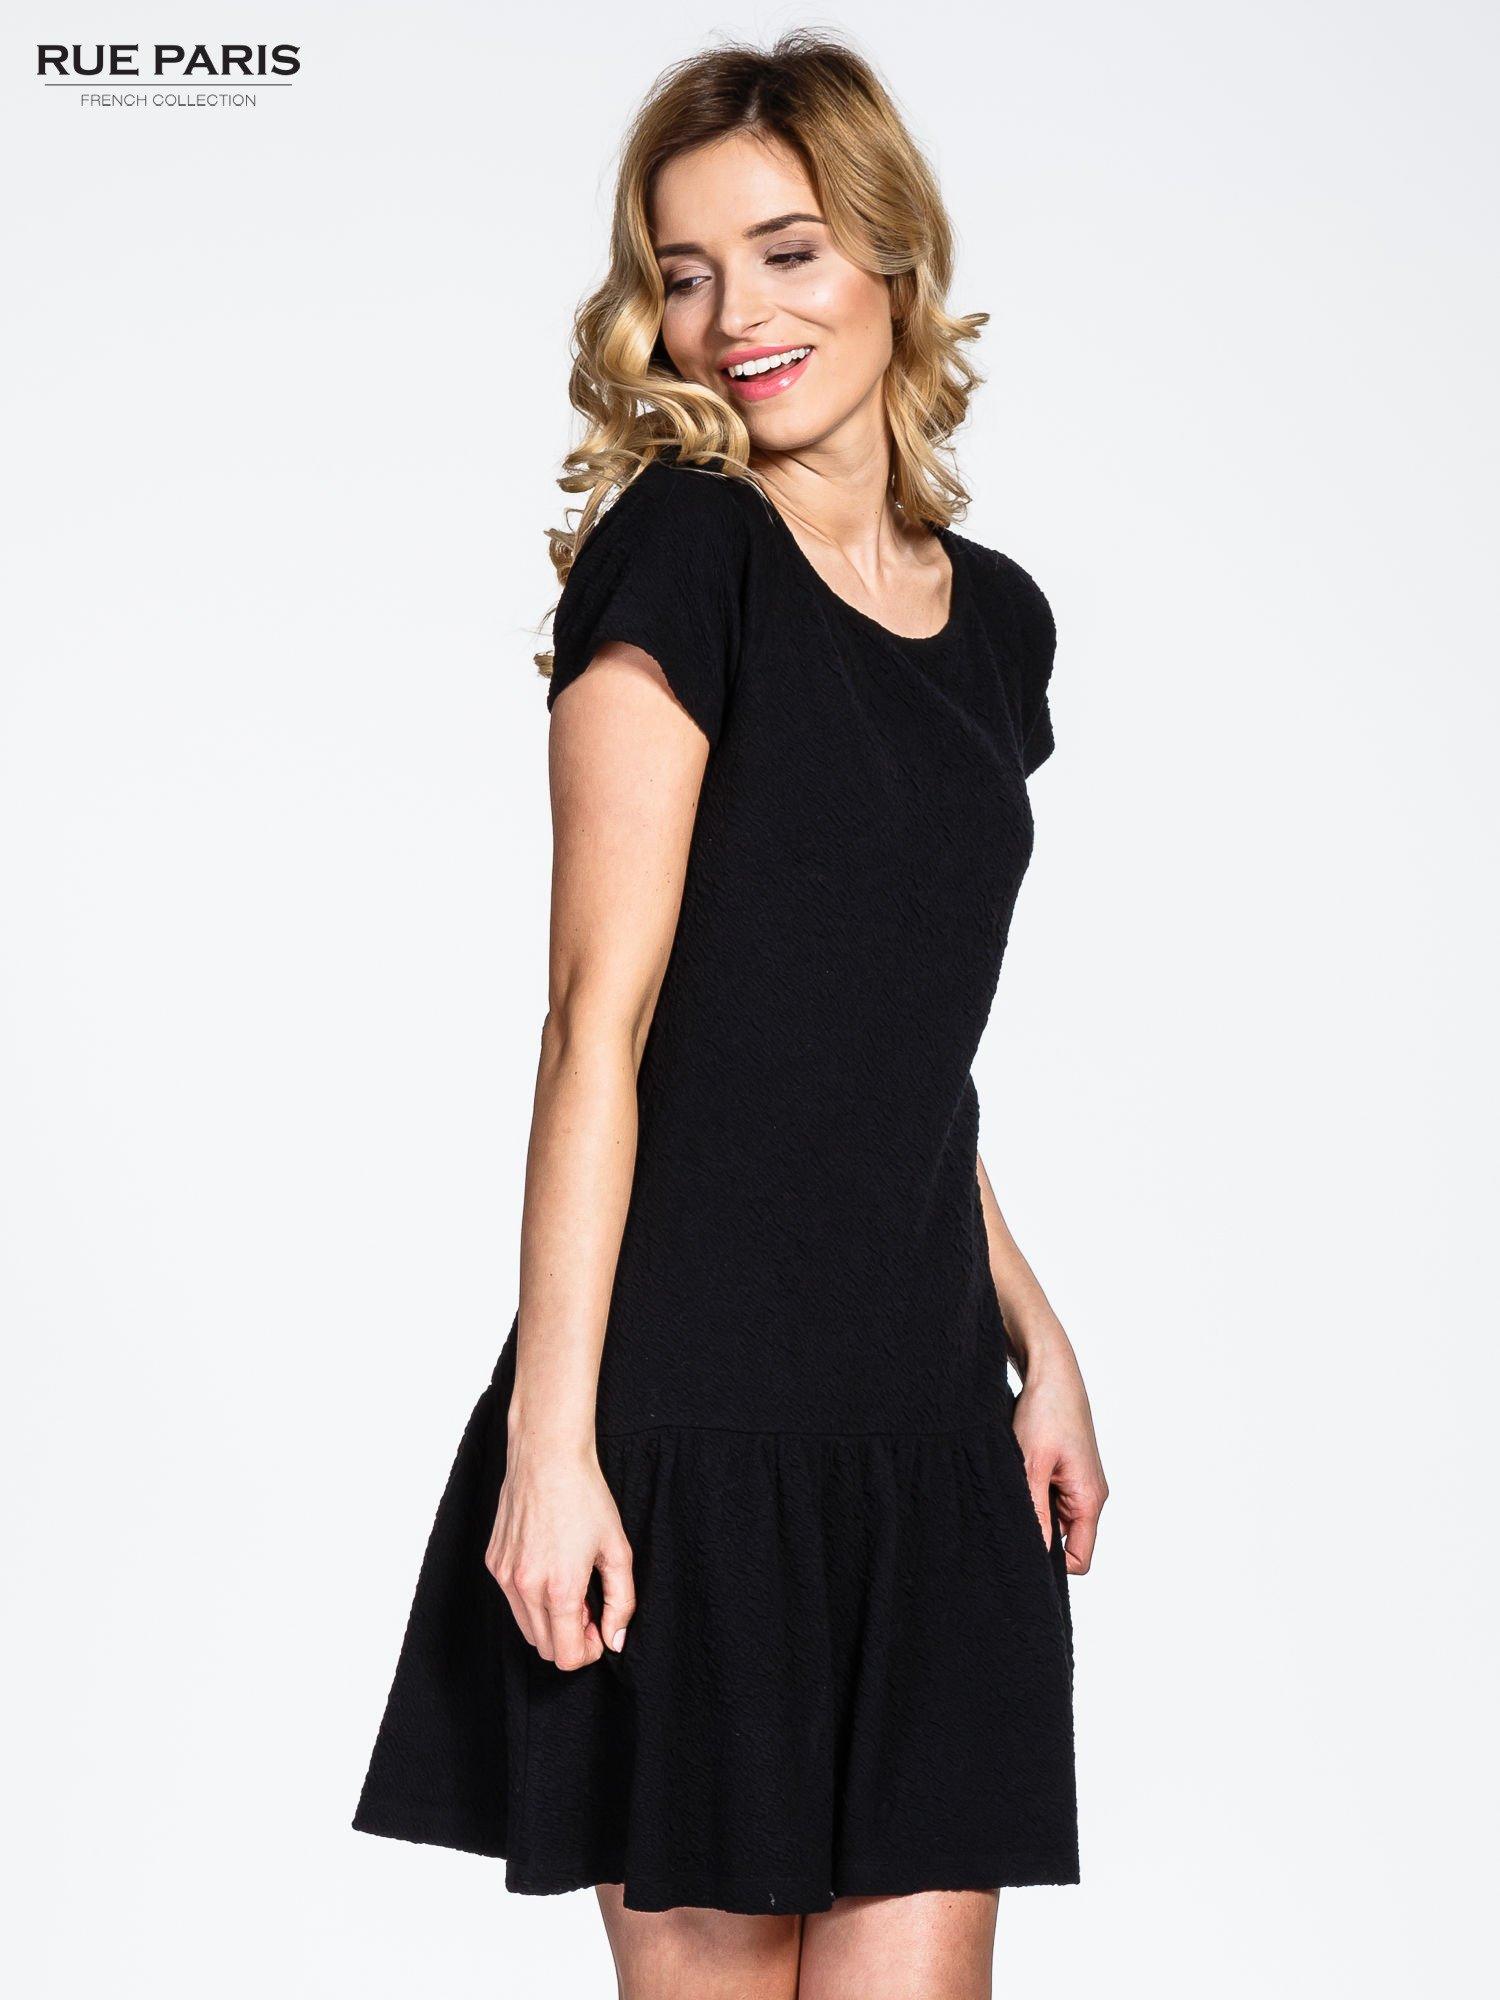 d35346a9d672 Czarna sukienka z obniżoną talią i falbaną na dole - Sukienka na co dzień -  sklep eButik.pl